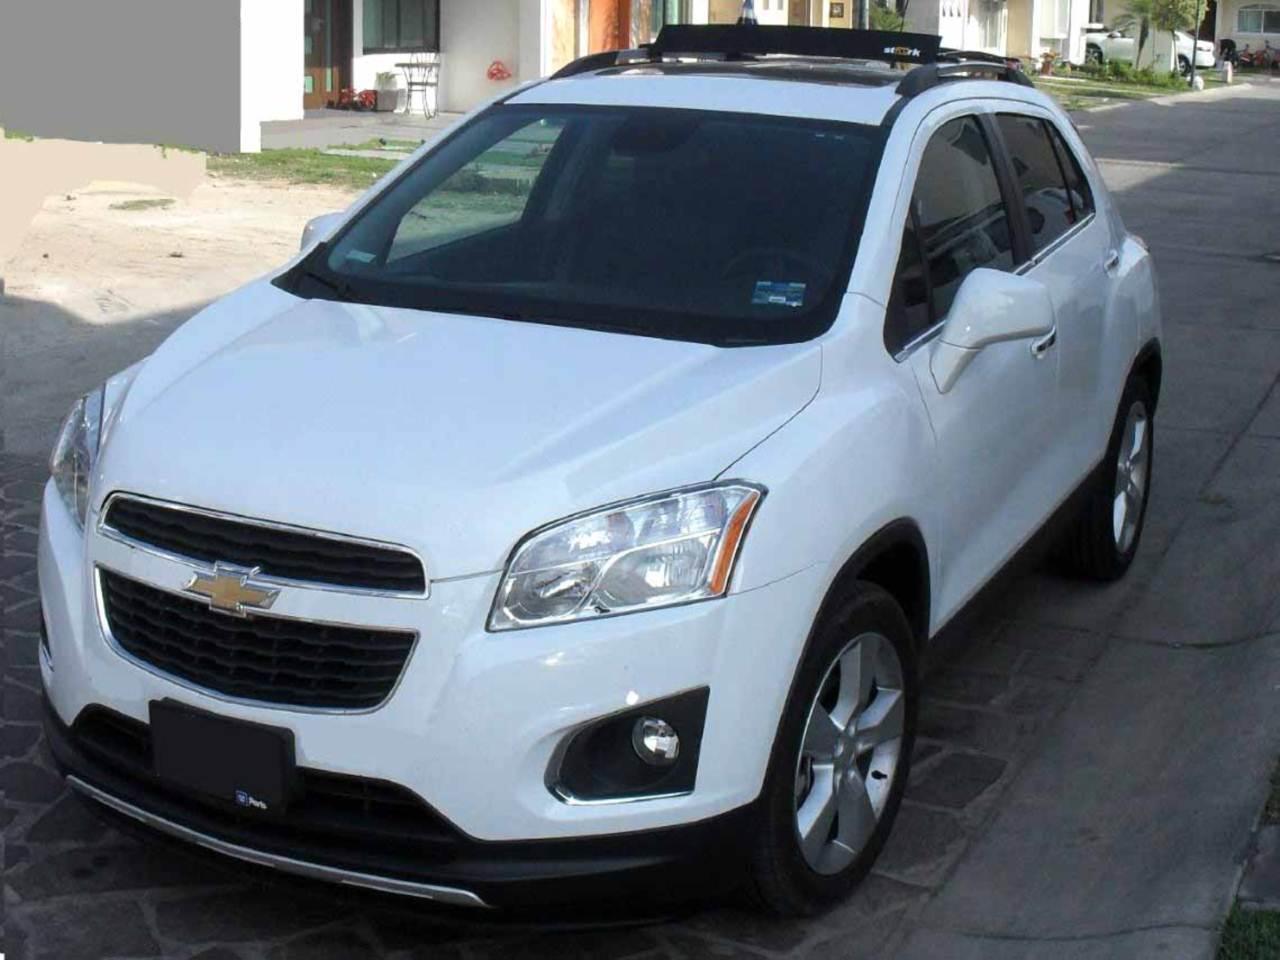 Chevrolet Tracker 2014 - carro do tipo crossover que chega ao Brasil